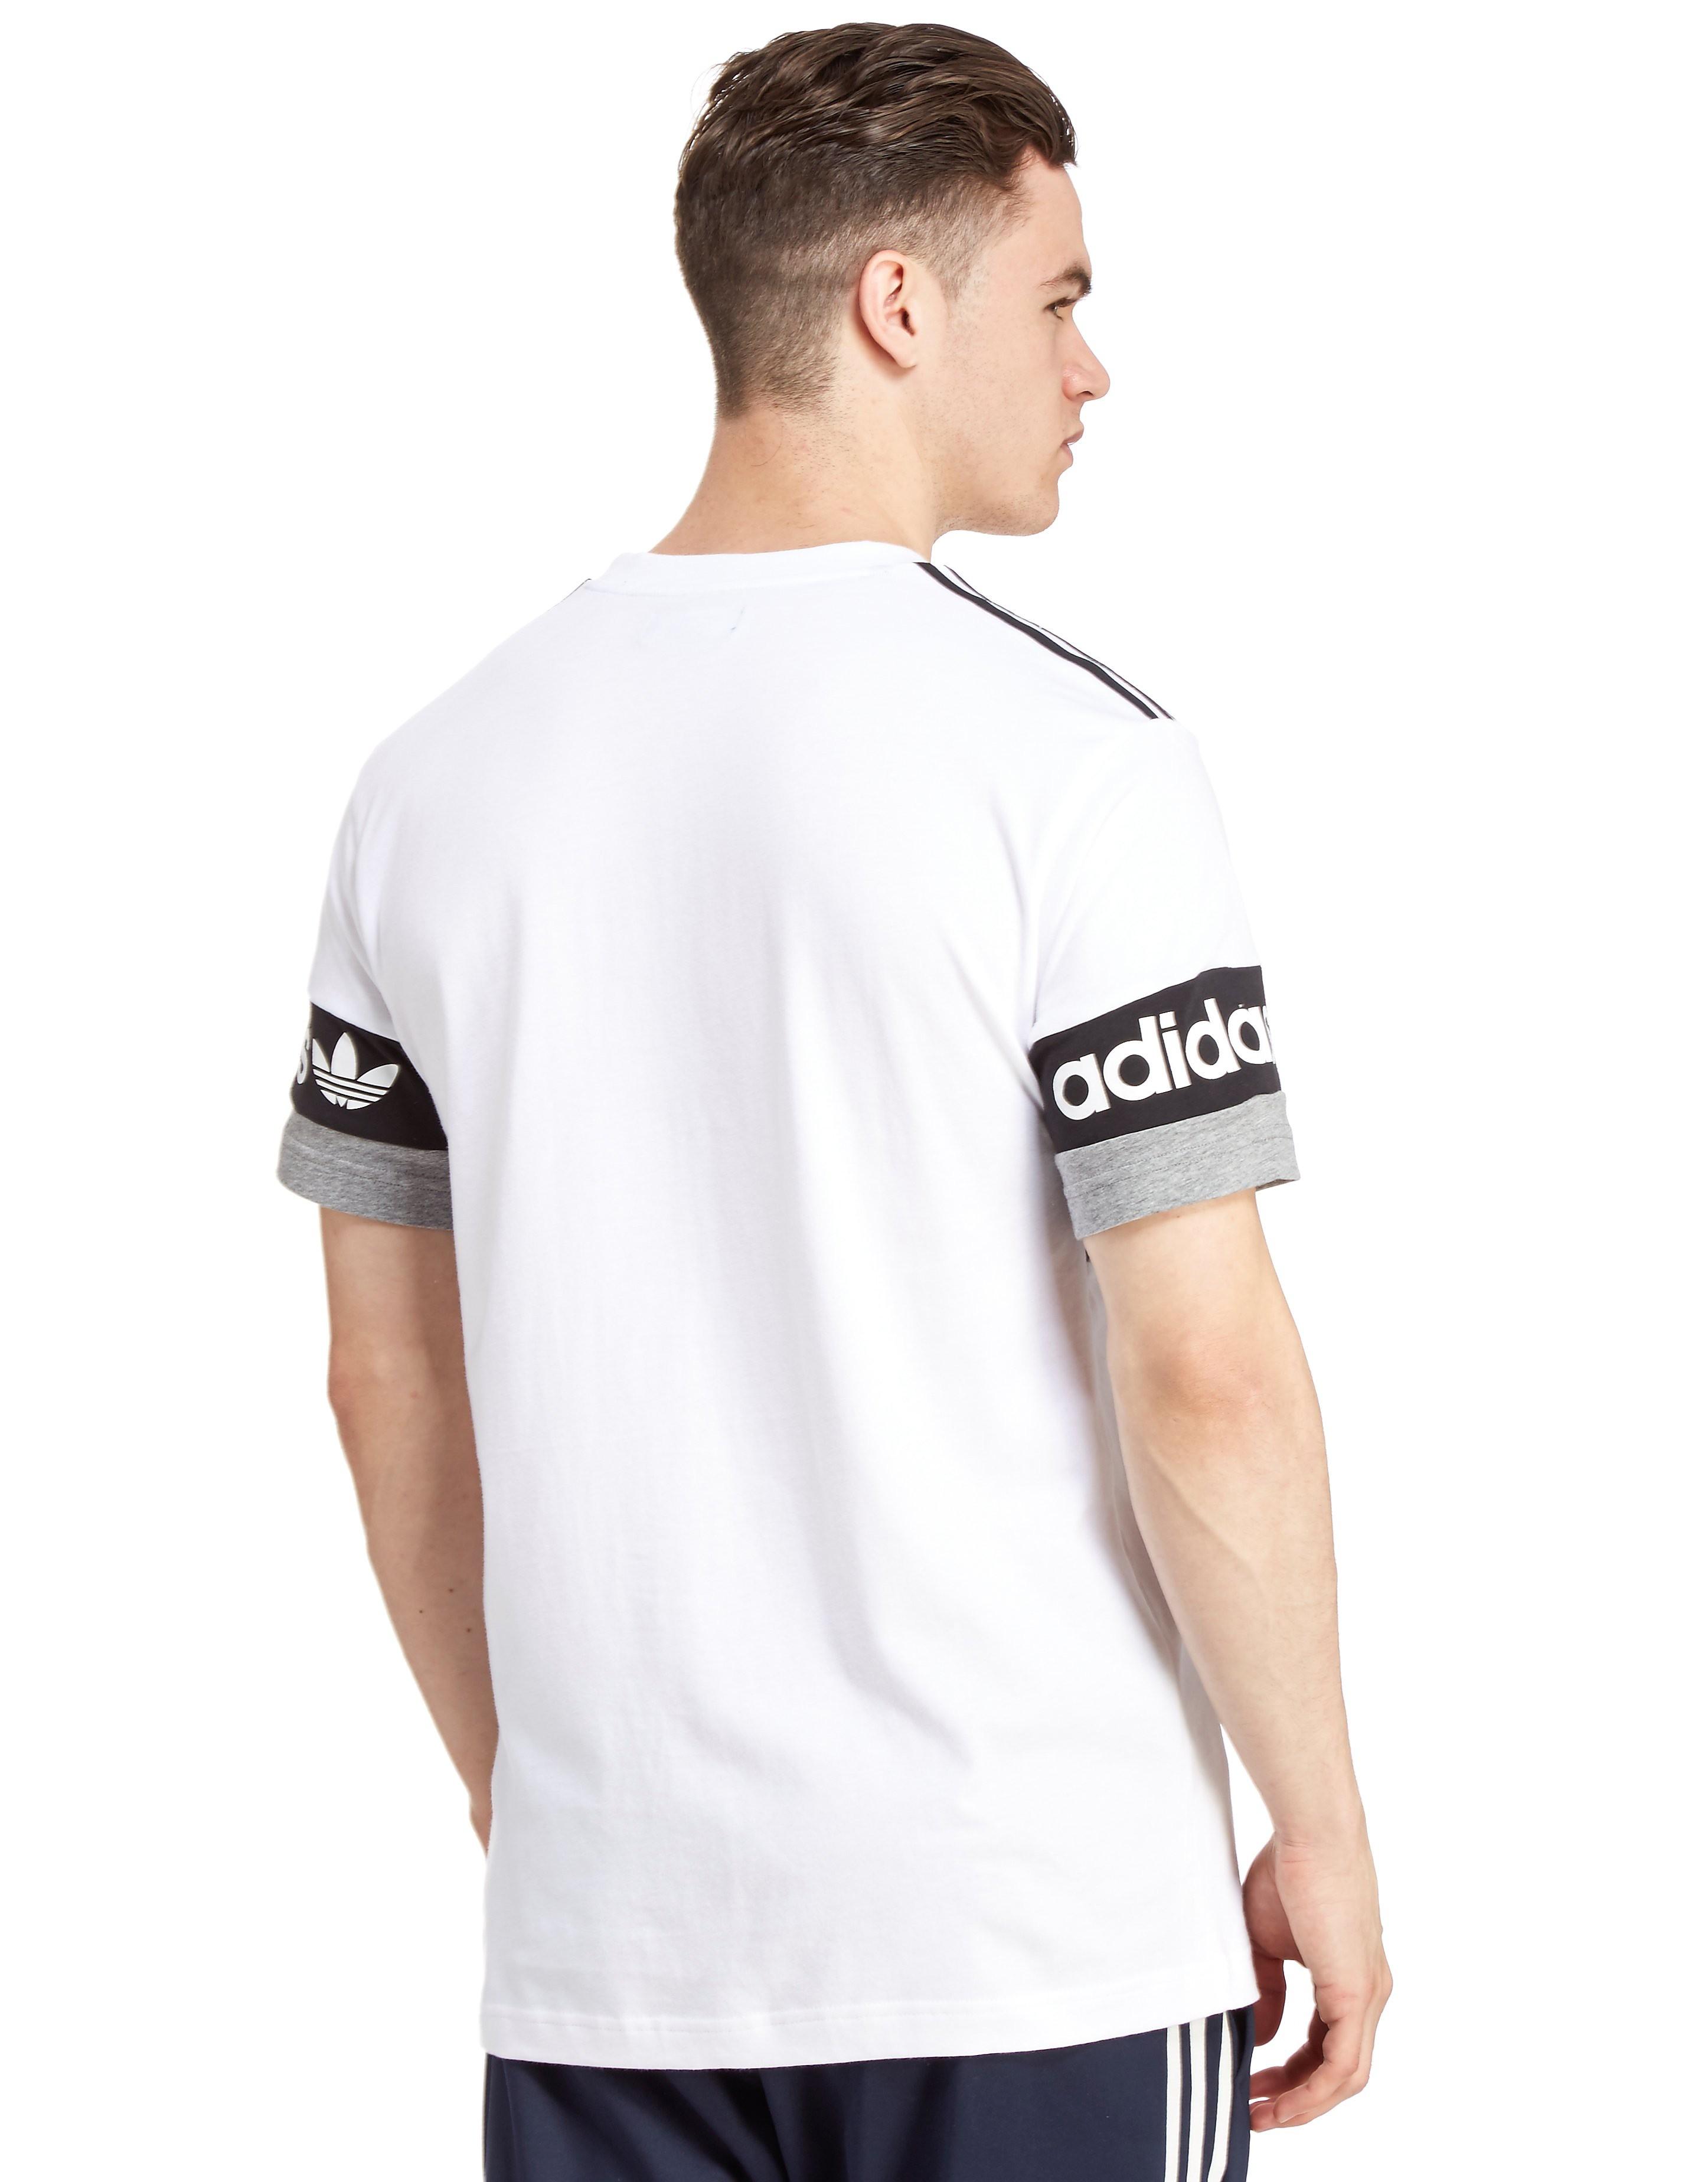 adidas Originals Street Running T-Shirt